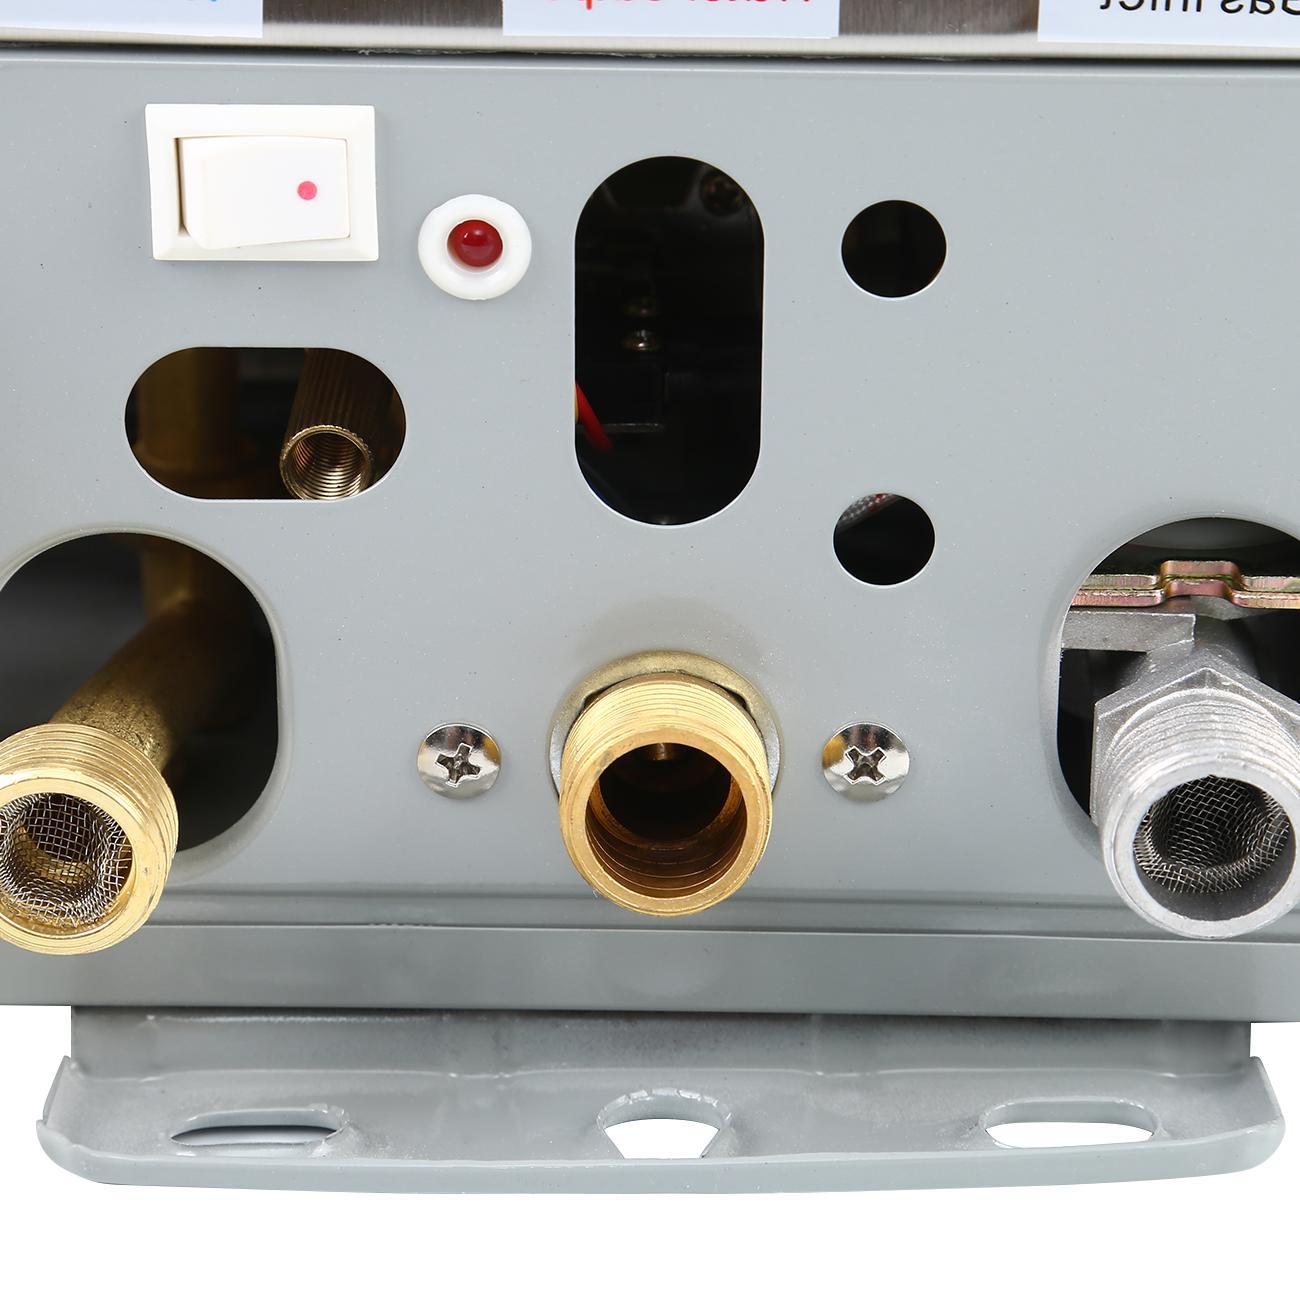 8L <font><b>Propane</b></font> <font><b>Gas</b></font> Tankless Water Stainless Steel